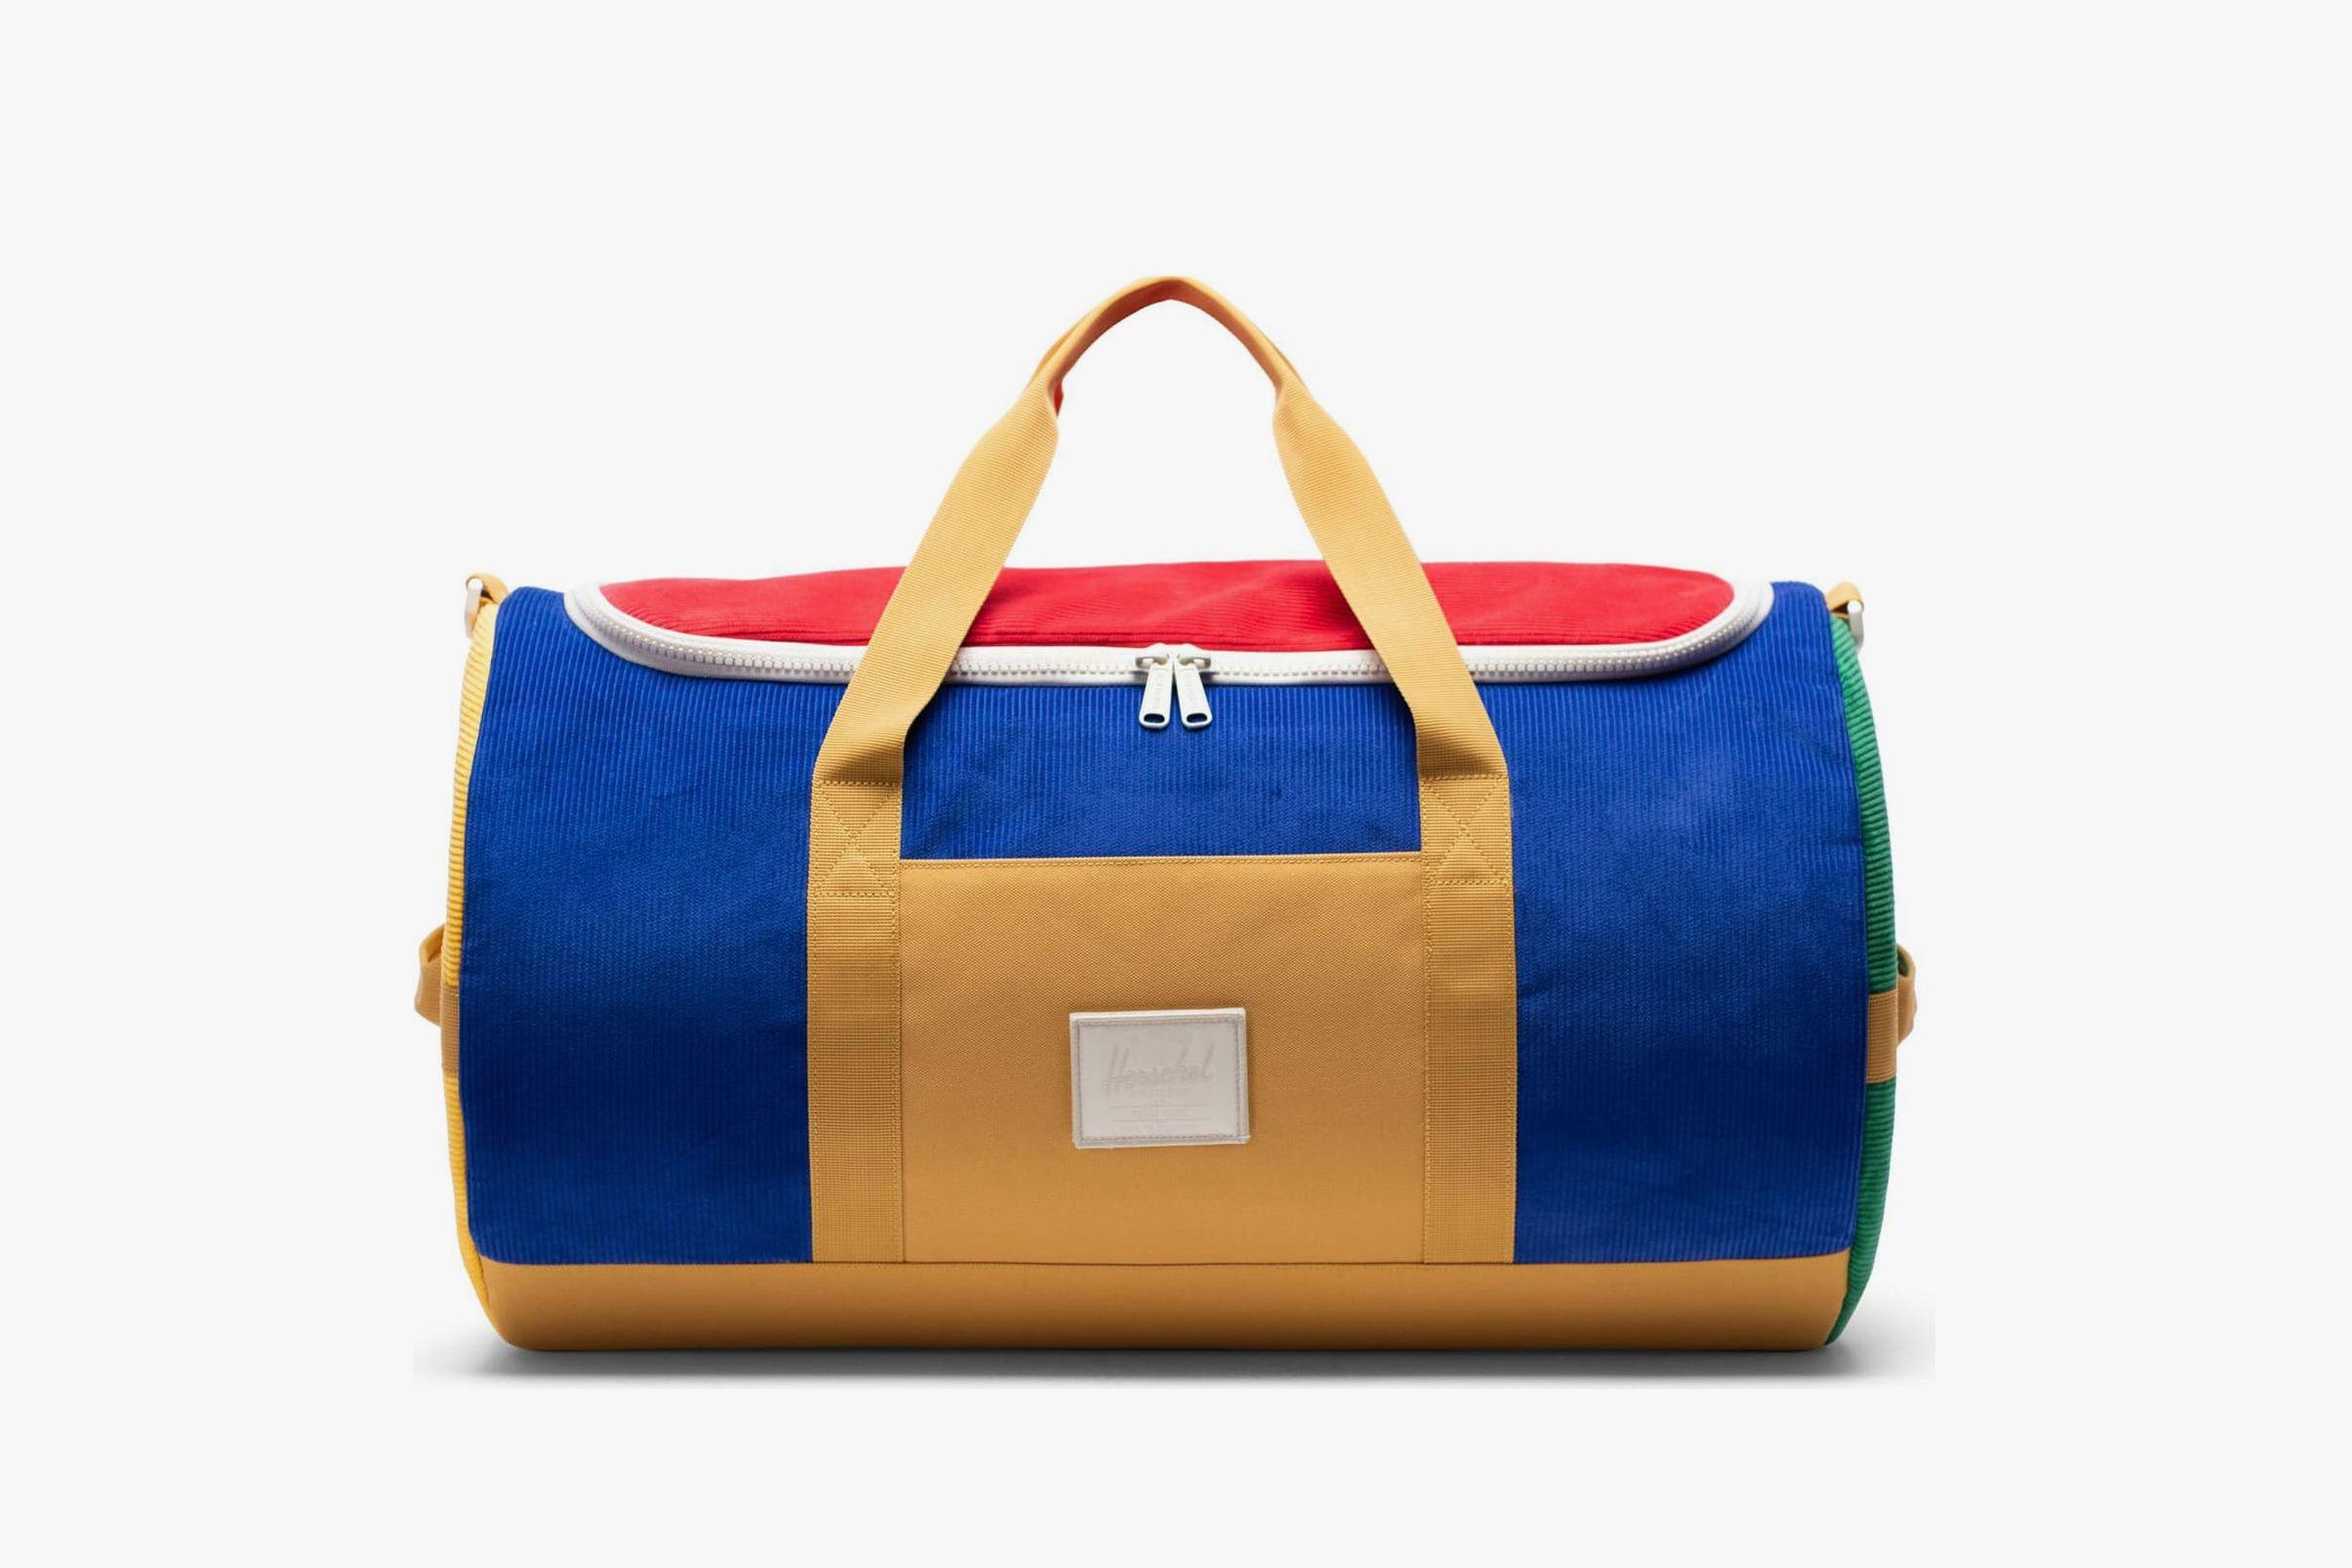 Herschel Supply Co. Sutton Colorblock Duffle Bag